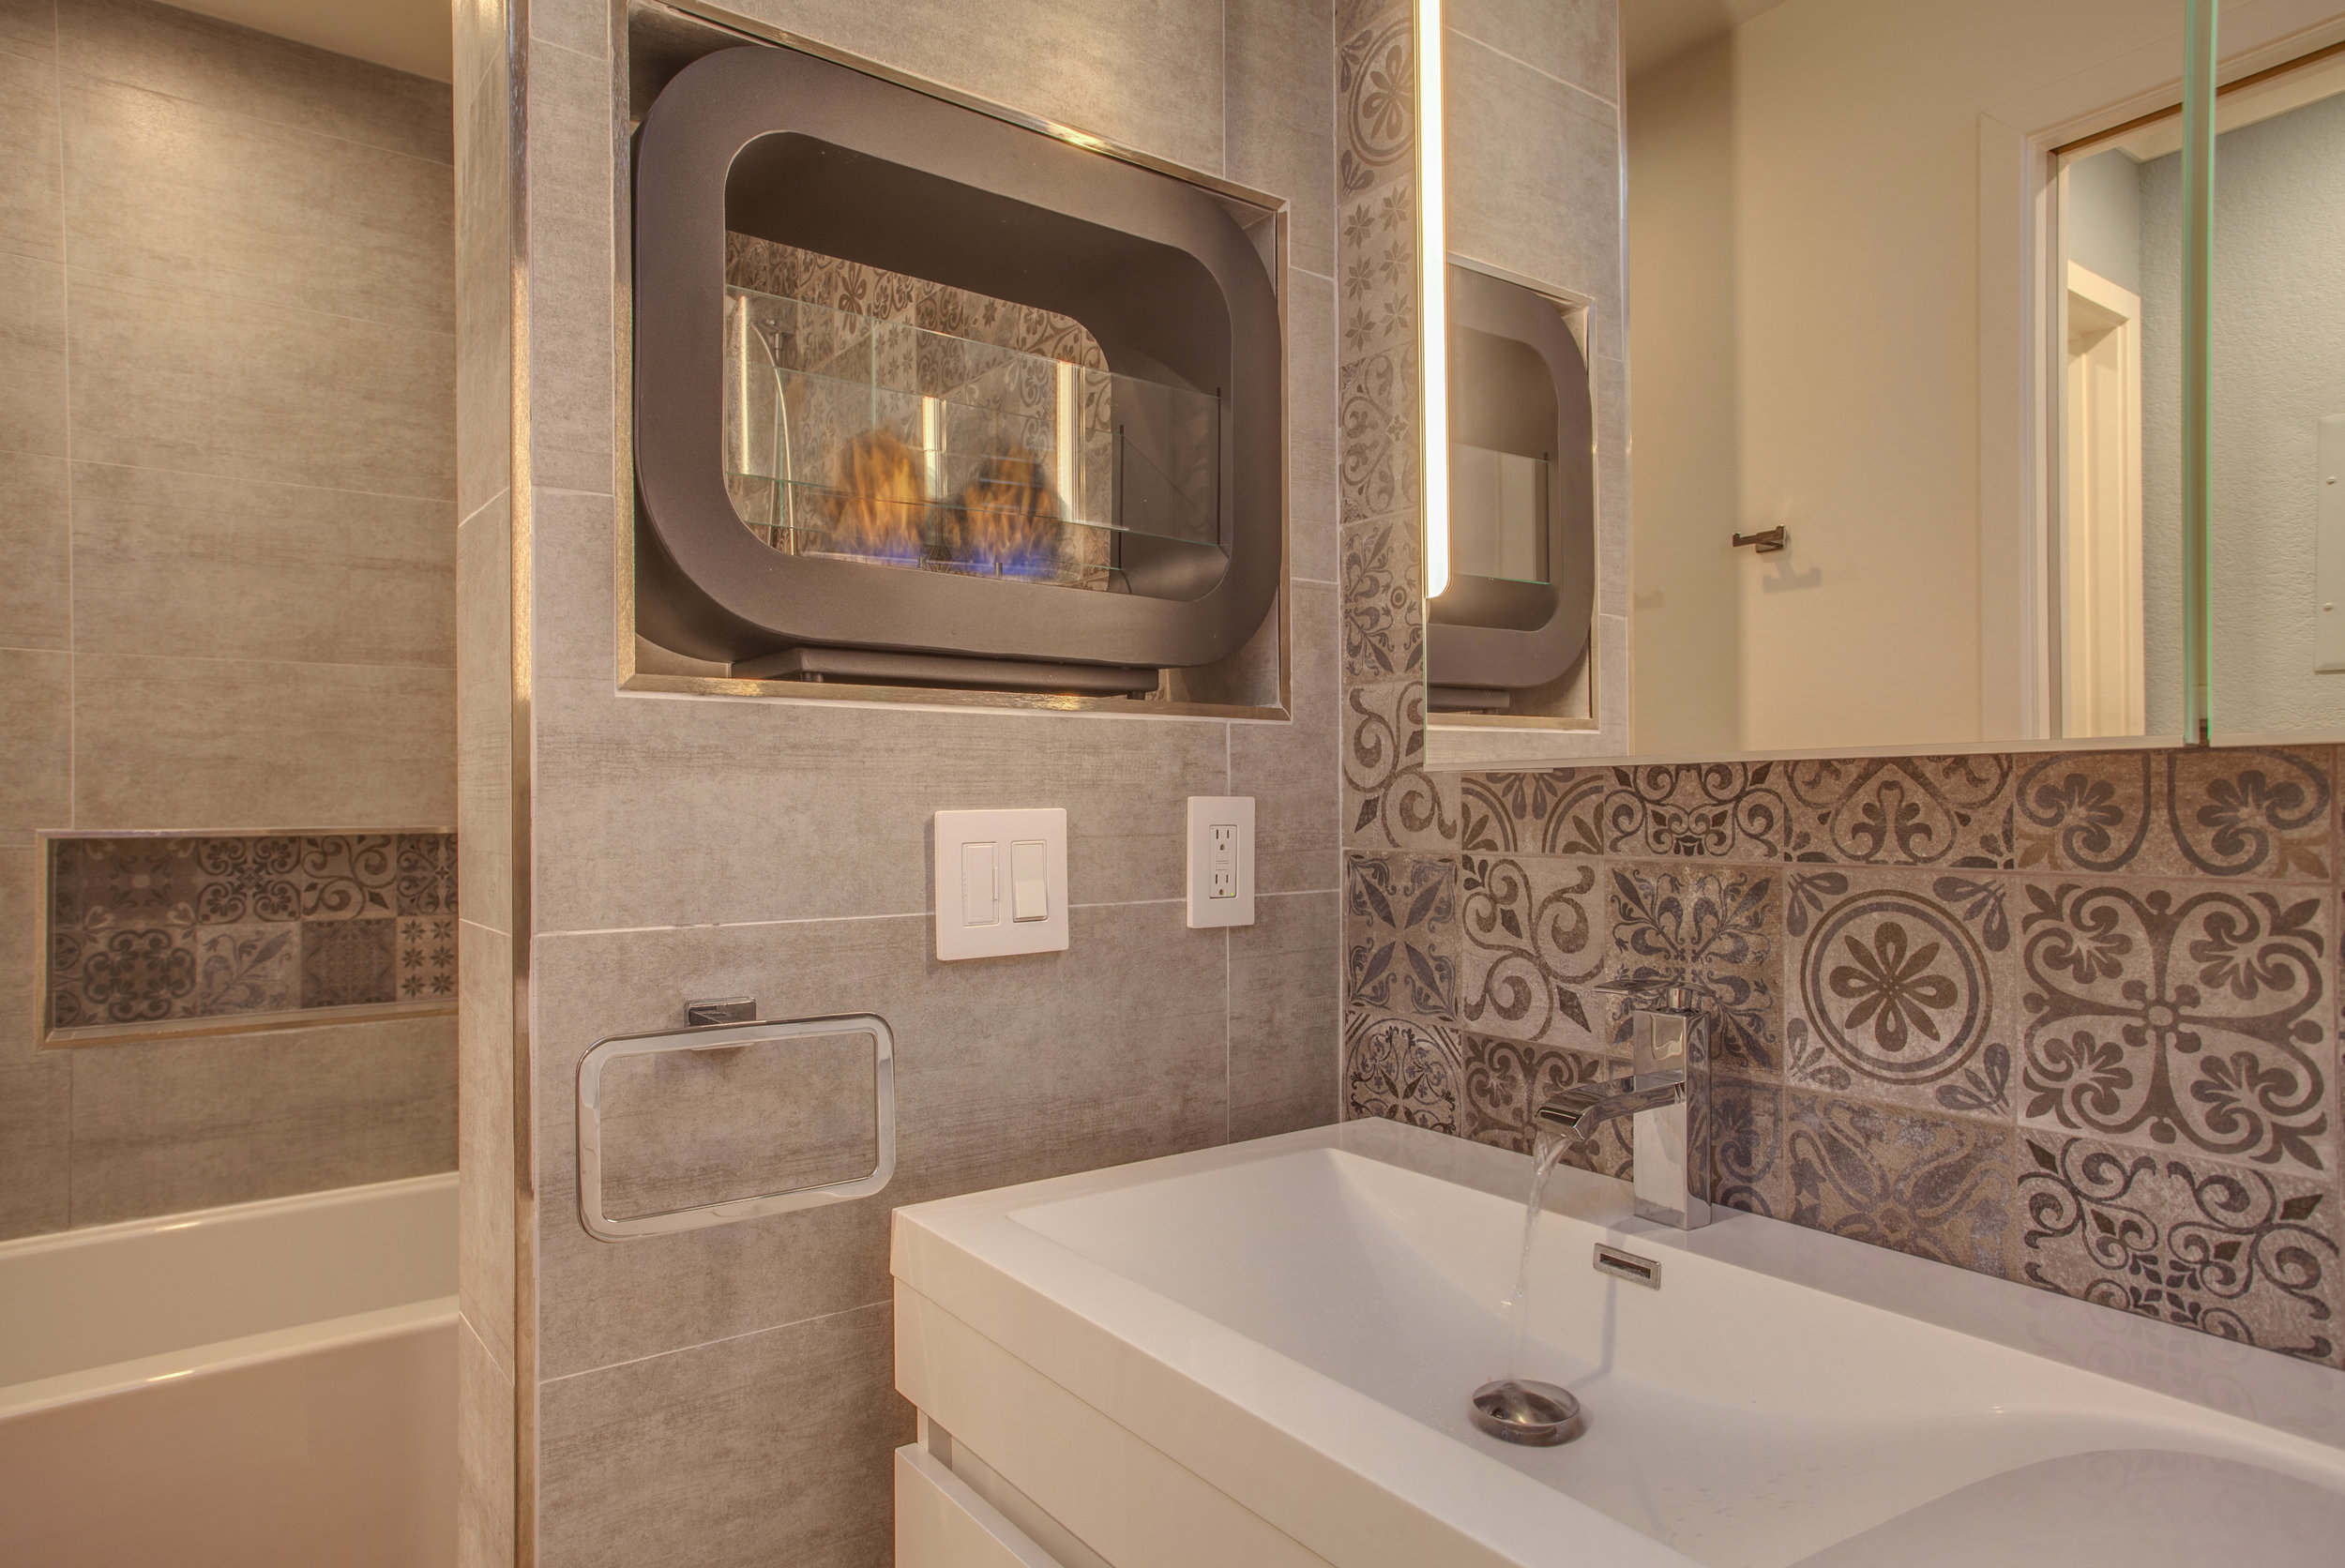 1106_la_terrace_circle_MLS_HID1123238_ROOMfullbathroom2.jpg